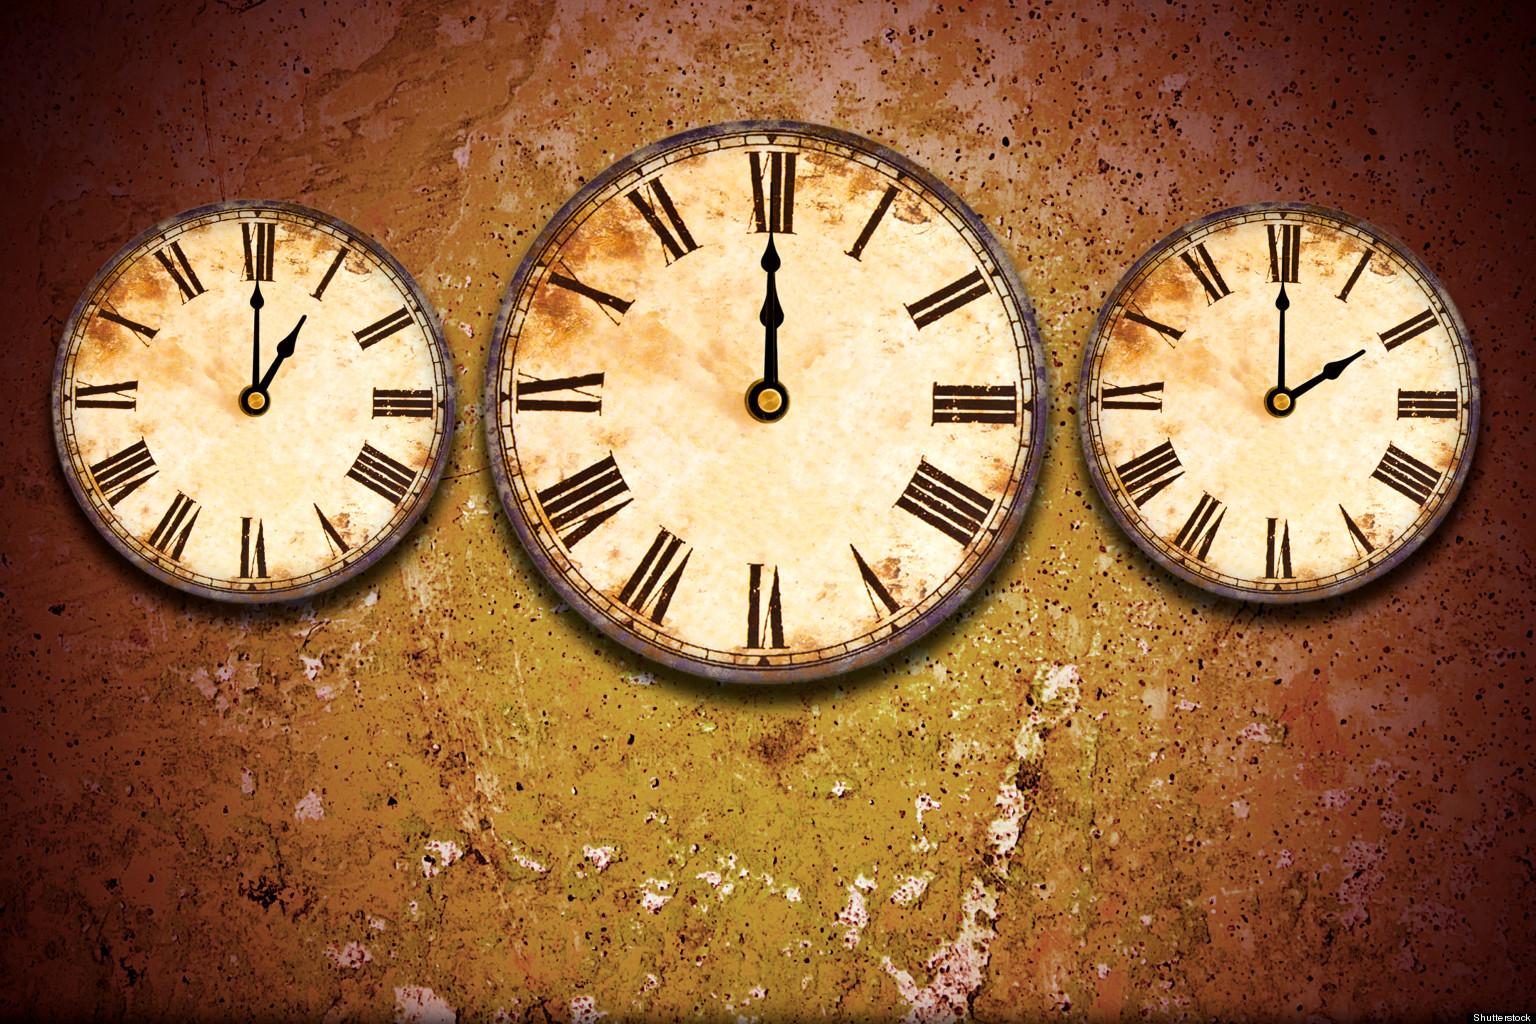 Time Change 2013: When Do Clocks Spring Forward?